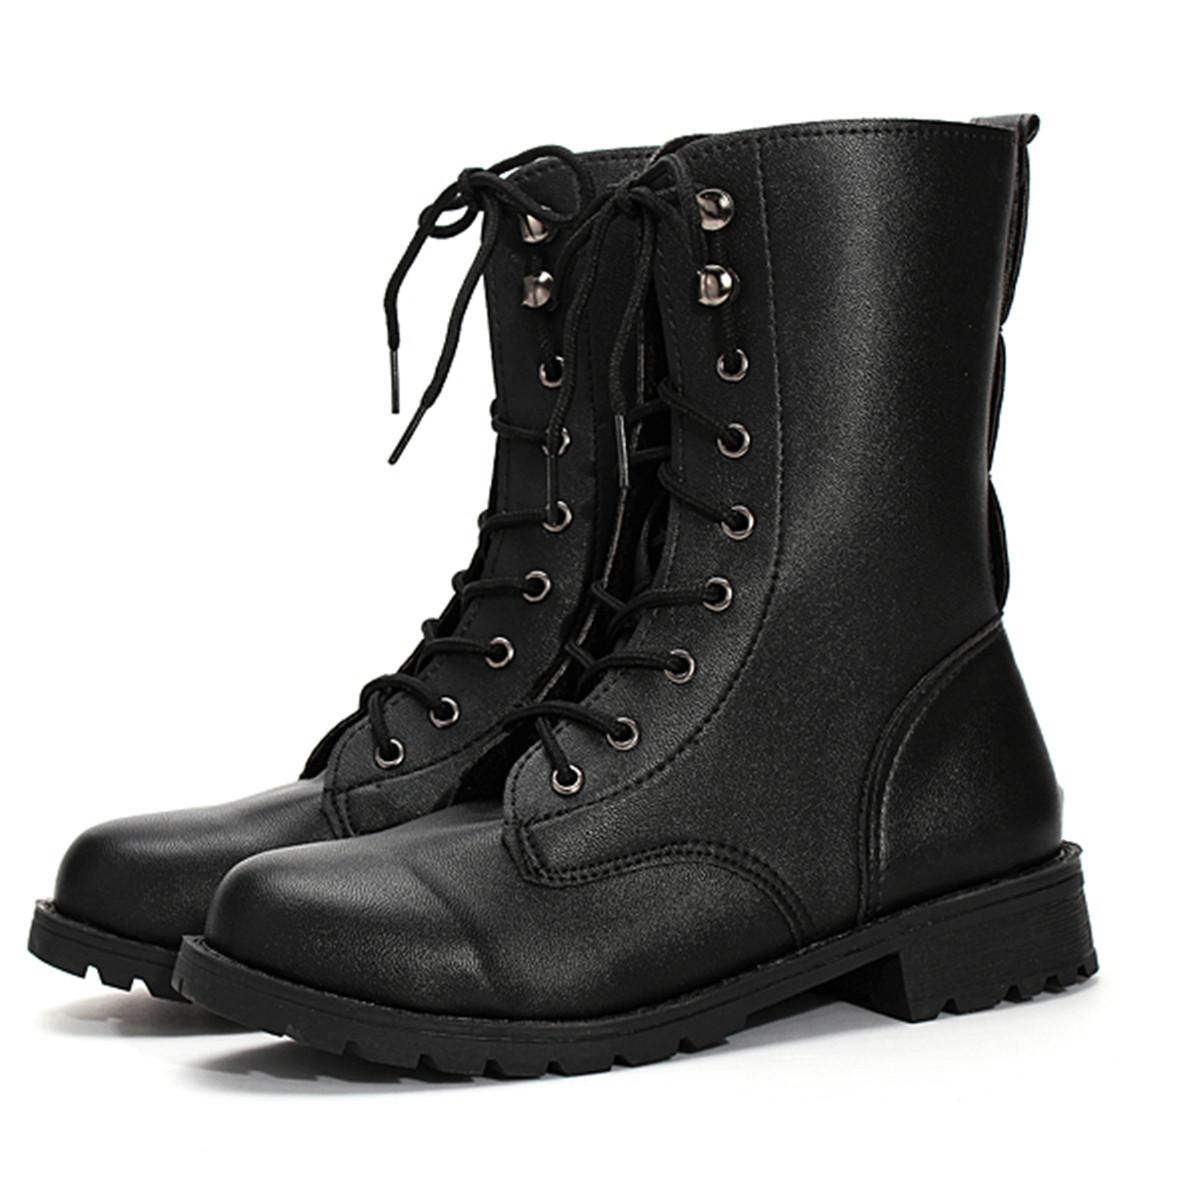 bottine bottes cuir noir punk martin chaussure motard lacet arm e montante femme ebay. Black Bedroom Furniture Sets. Home Design Ideas